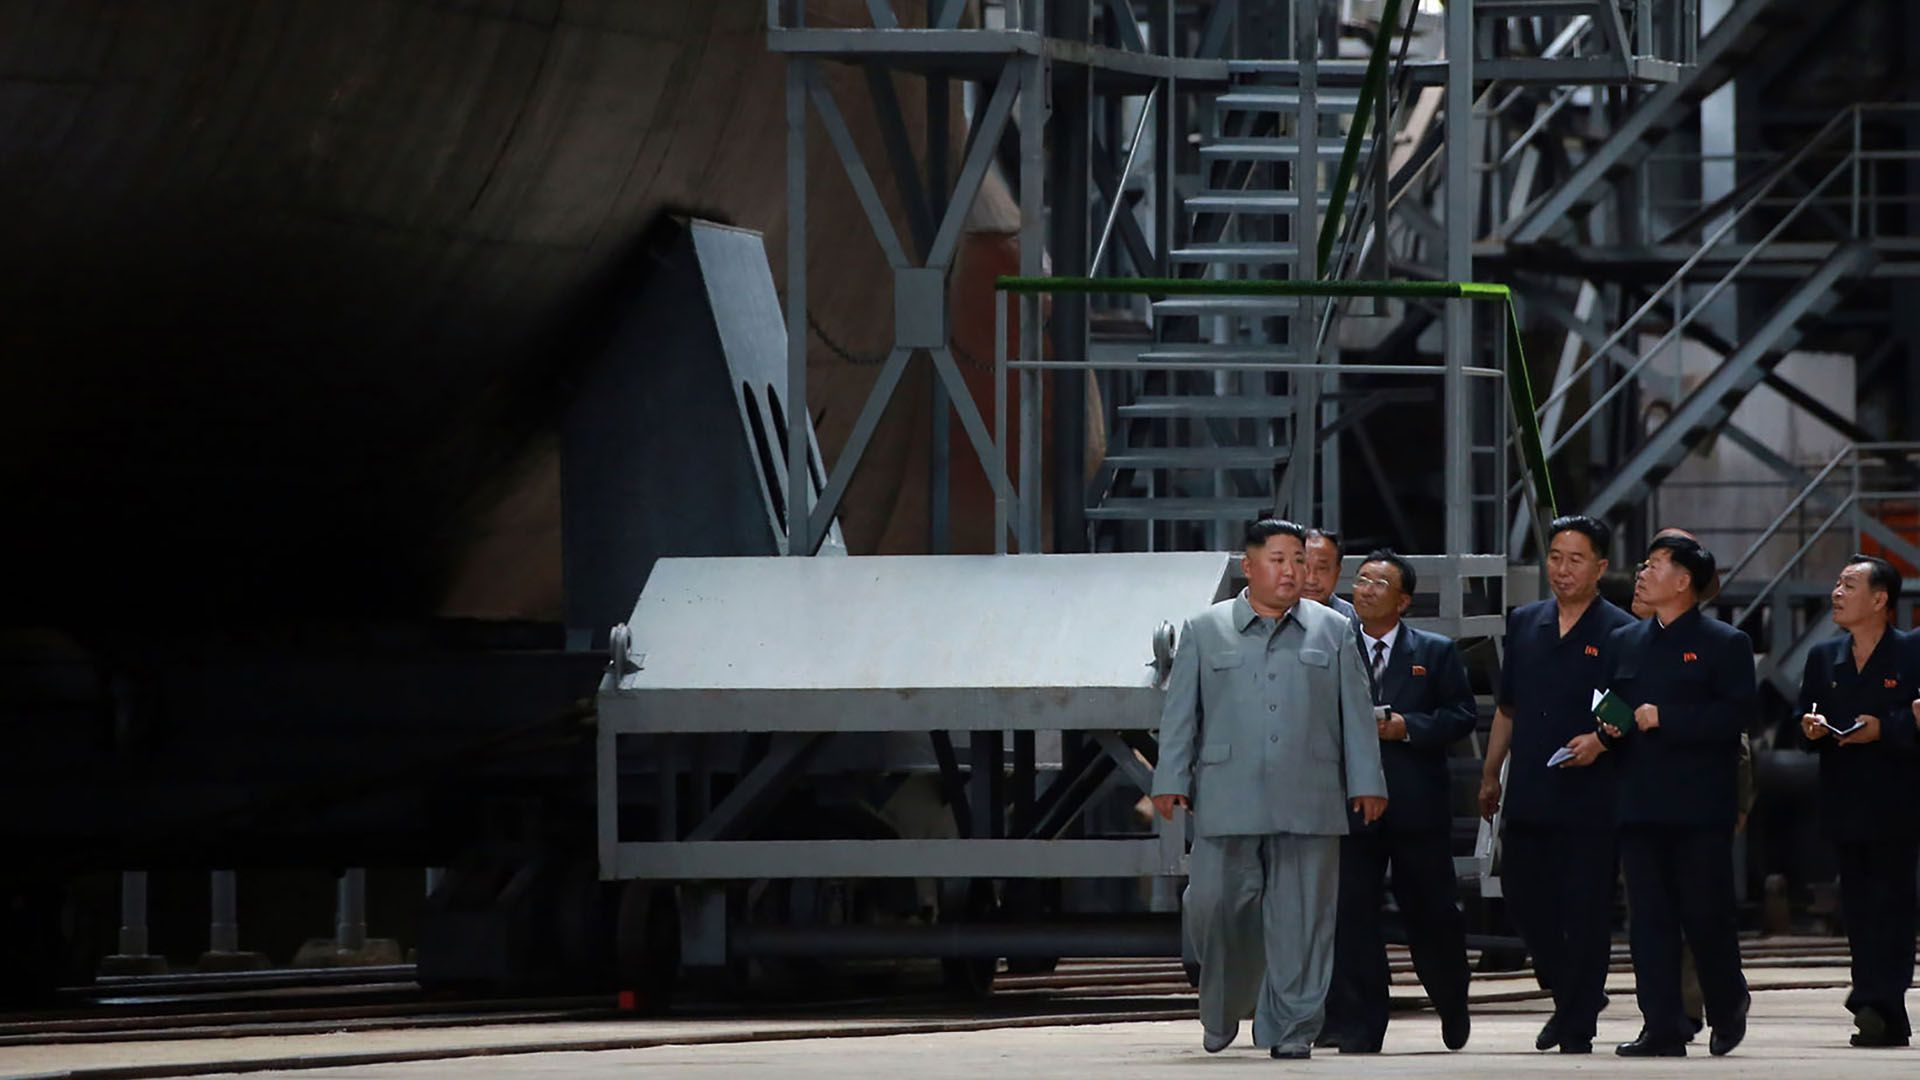 El líder norcoreano recorre el astillero (KCNA VIA KNS / KCNA VIA KNS / AFP)